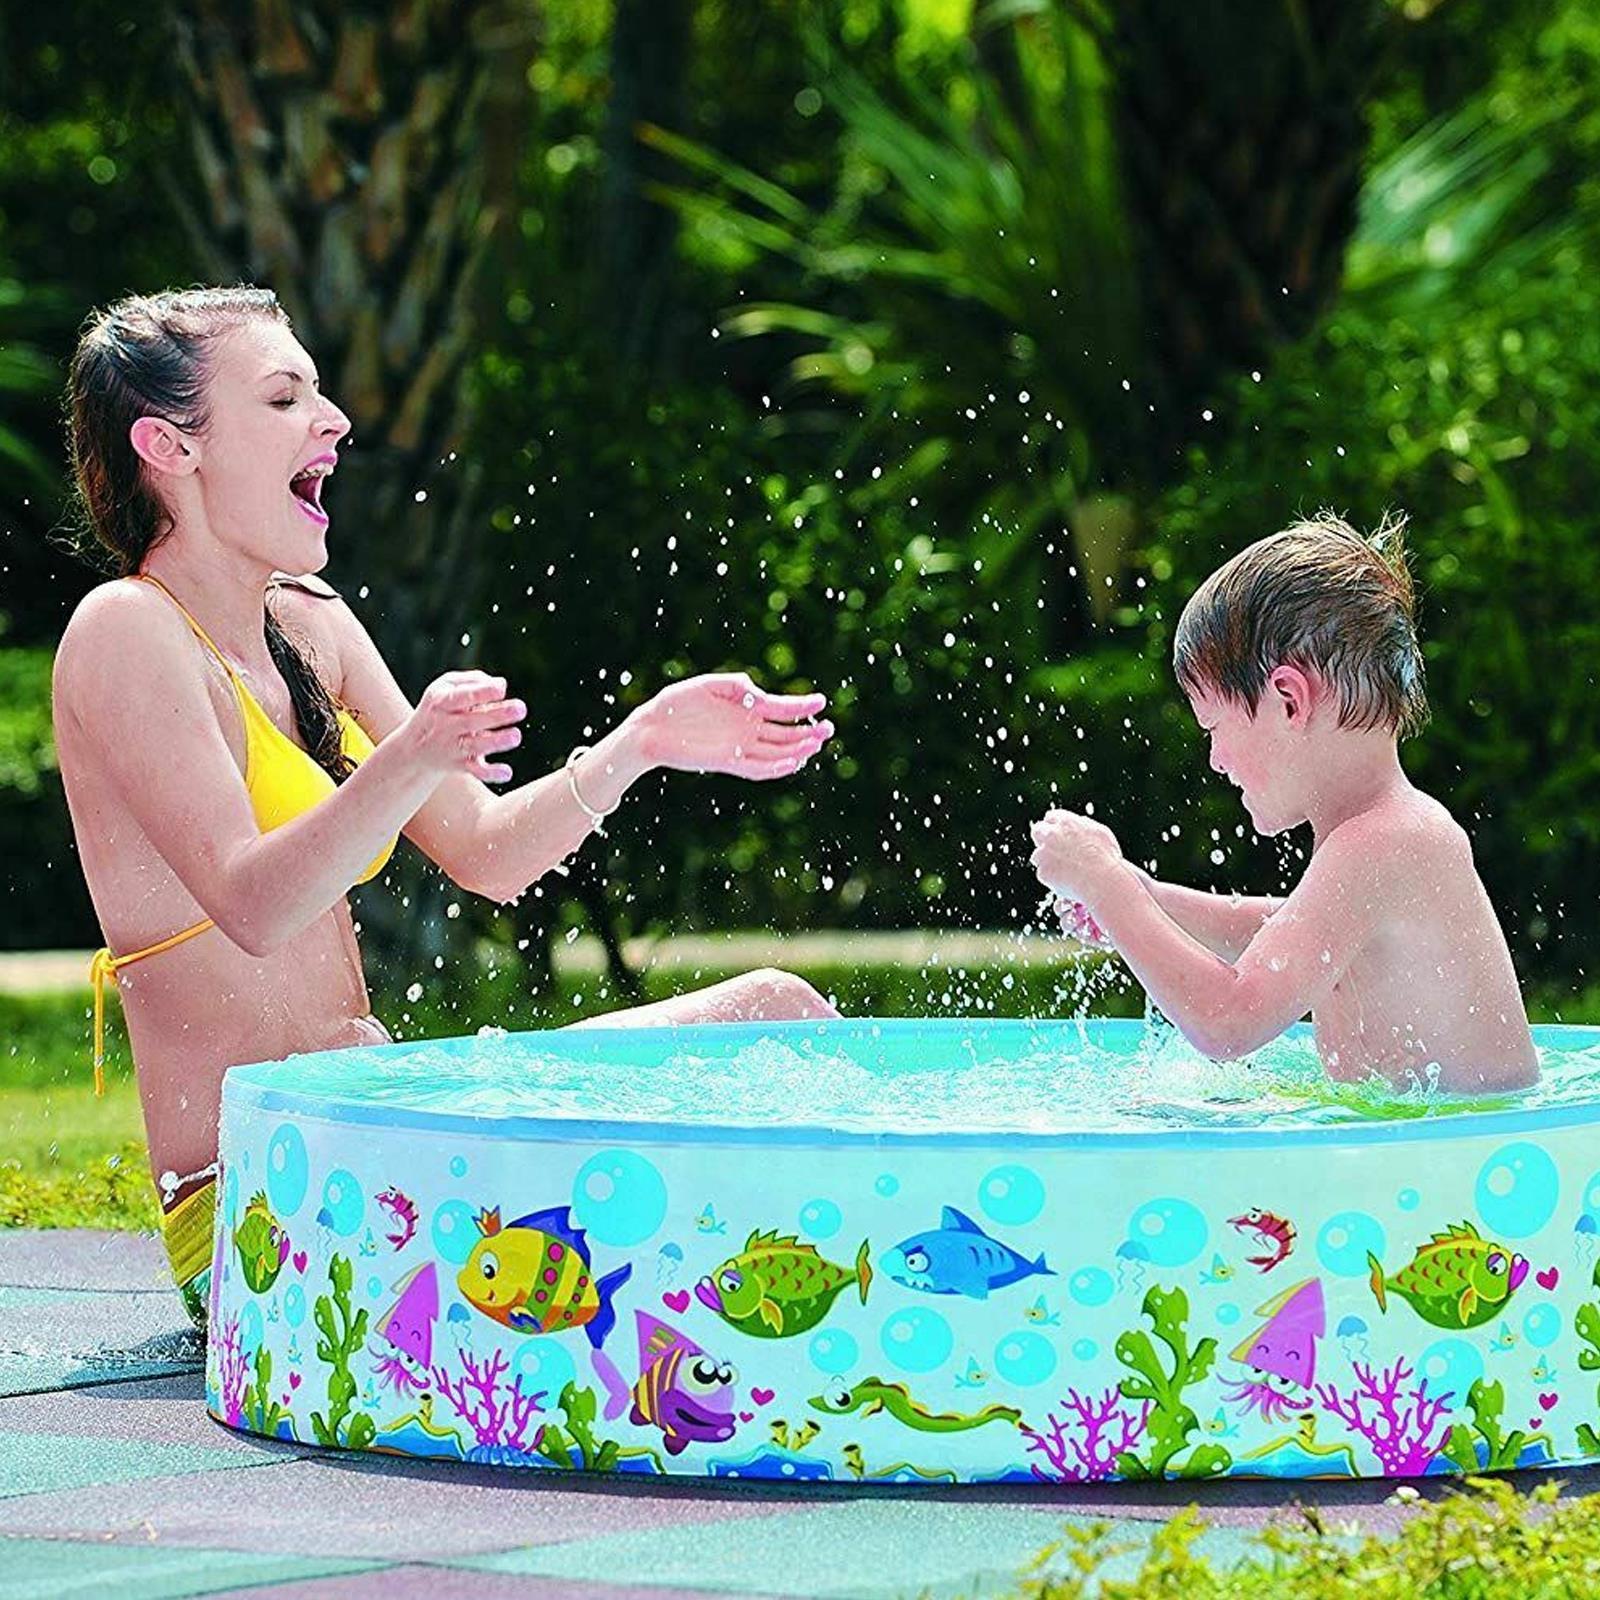 Centro-De-Juegos-De-Natacion-Ninos-Ridgid-Pared-piscina-infantil-Mar-Vida-al-Aire-Libre-diversion miniatura 10